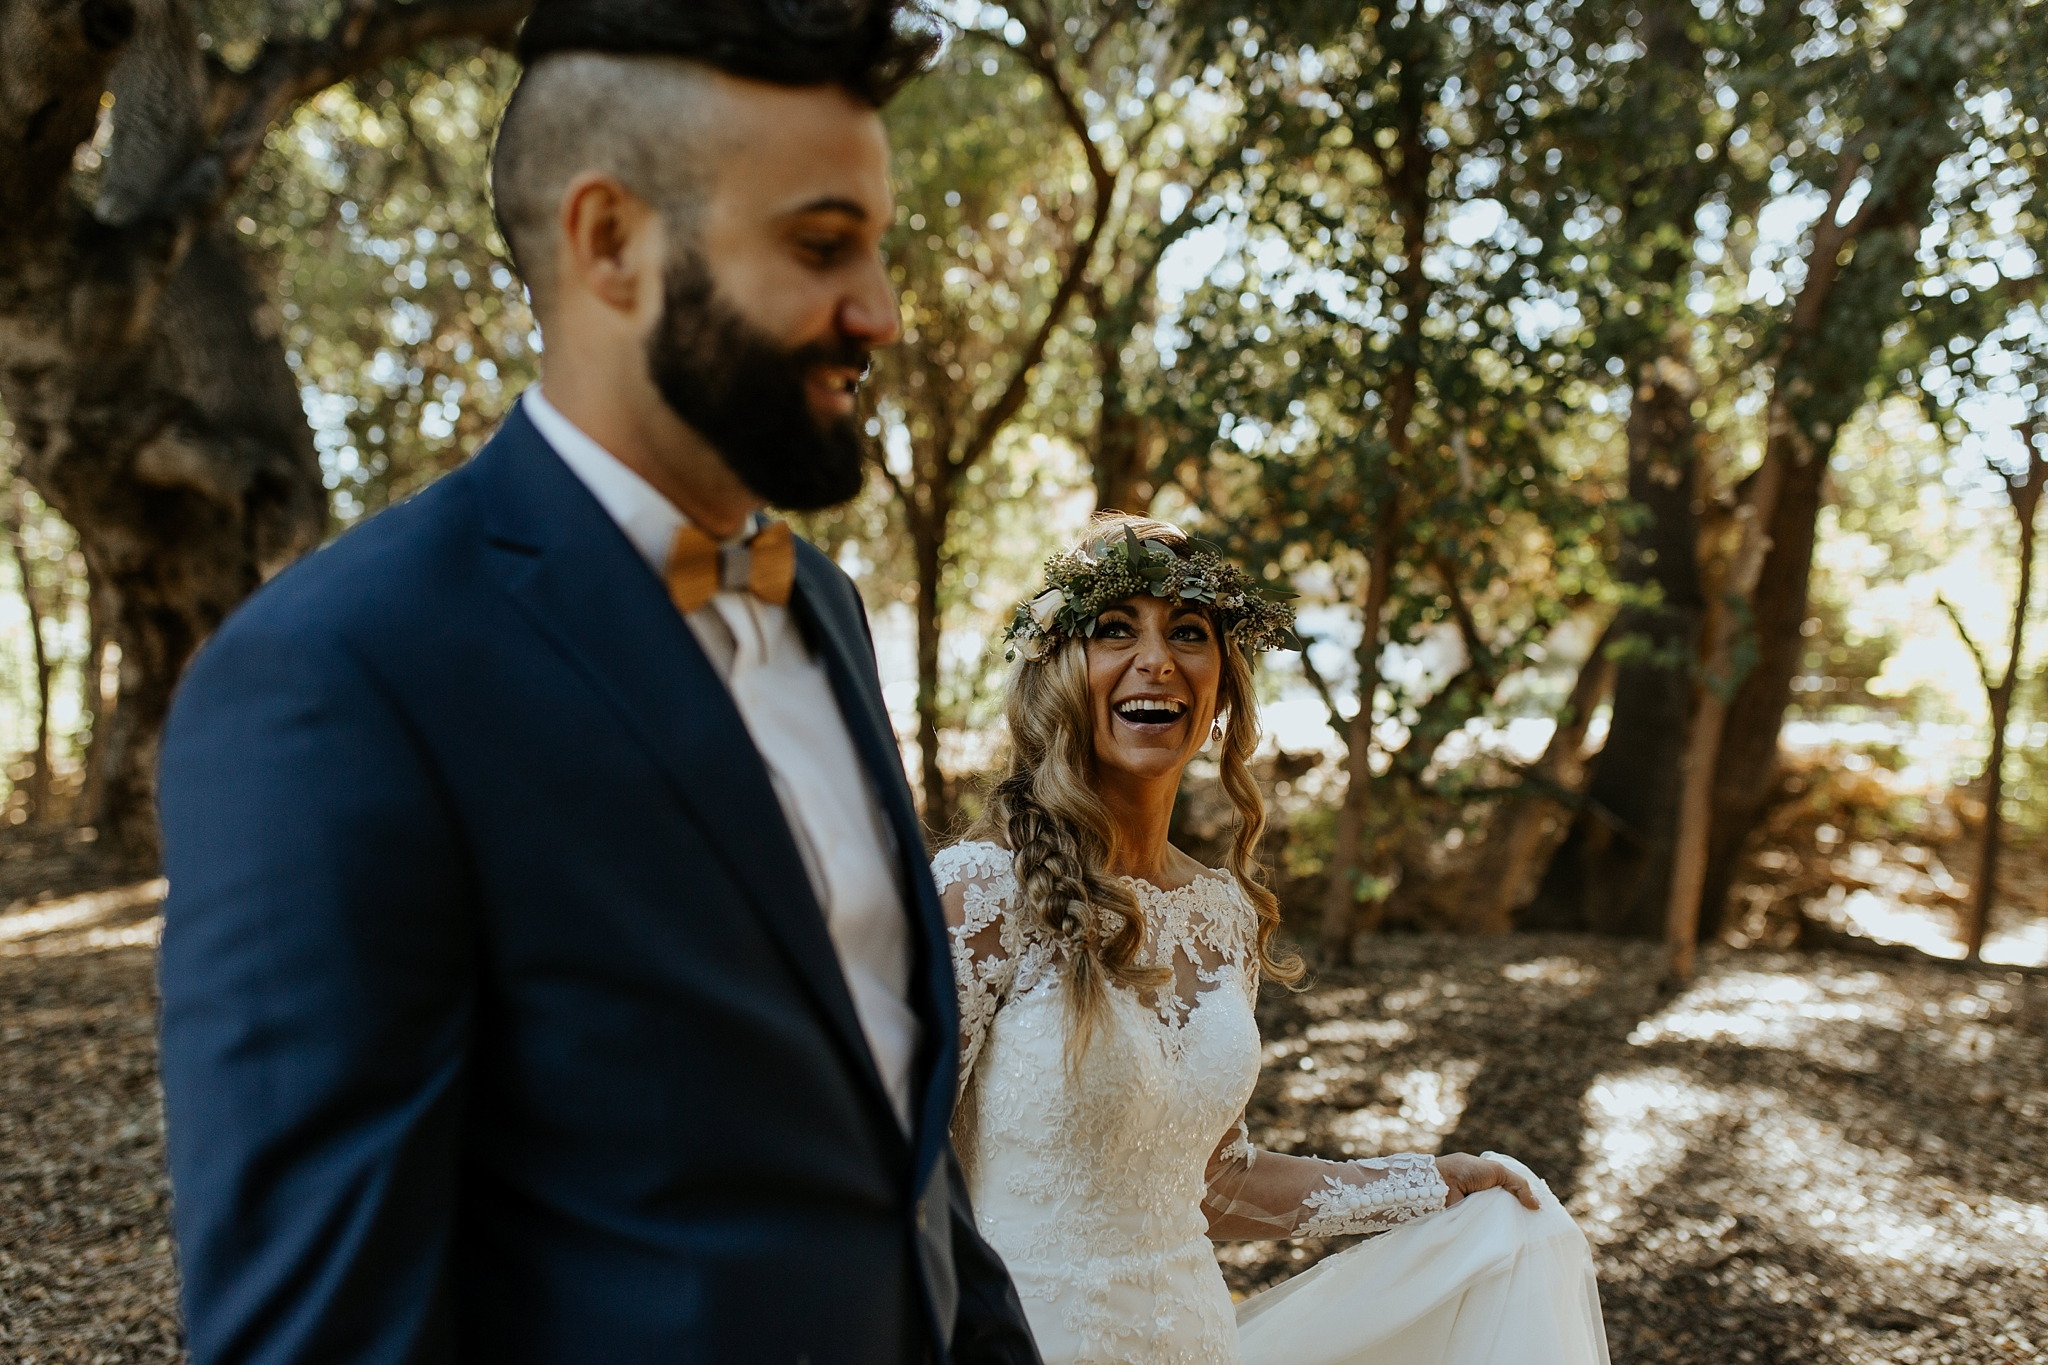 Bohemian Orcutt Ranch Wedding in Los Angeles California  - Los Angeles Californai Wedding Photographer_0012.jpg